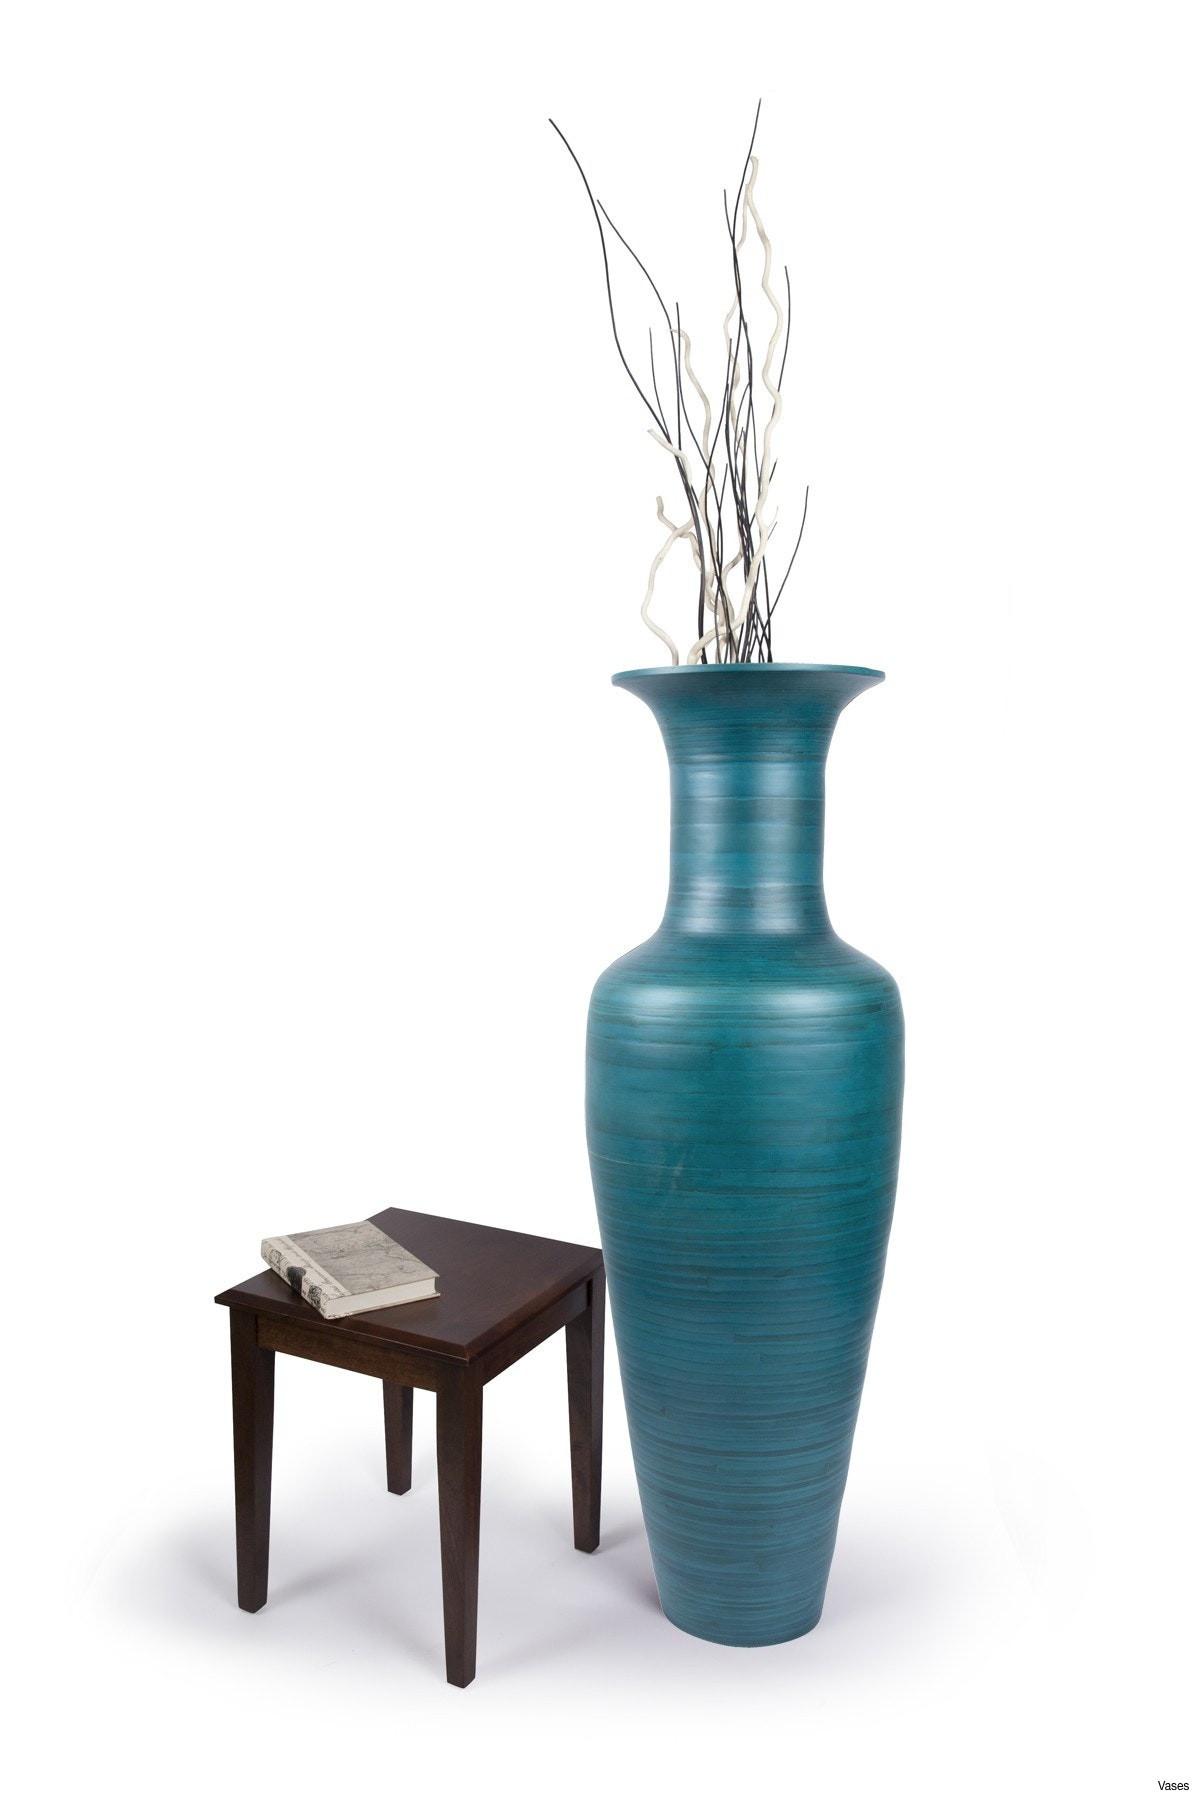 20 Famous Bamboo Vase Ideas 2021 free download bamboo vase ideas of fresh blue floor metalorgtfo com metalorgtfo com in ideas graph ac2b7 blue floor new inspiring blue floor vases home design vase with bamboo sticks